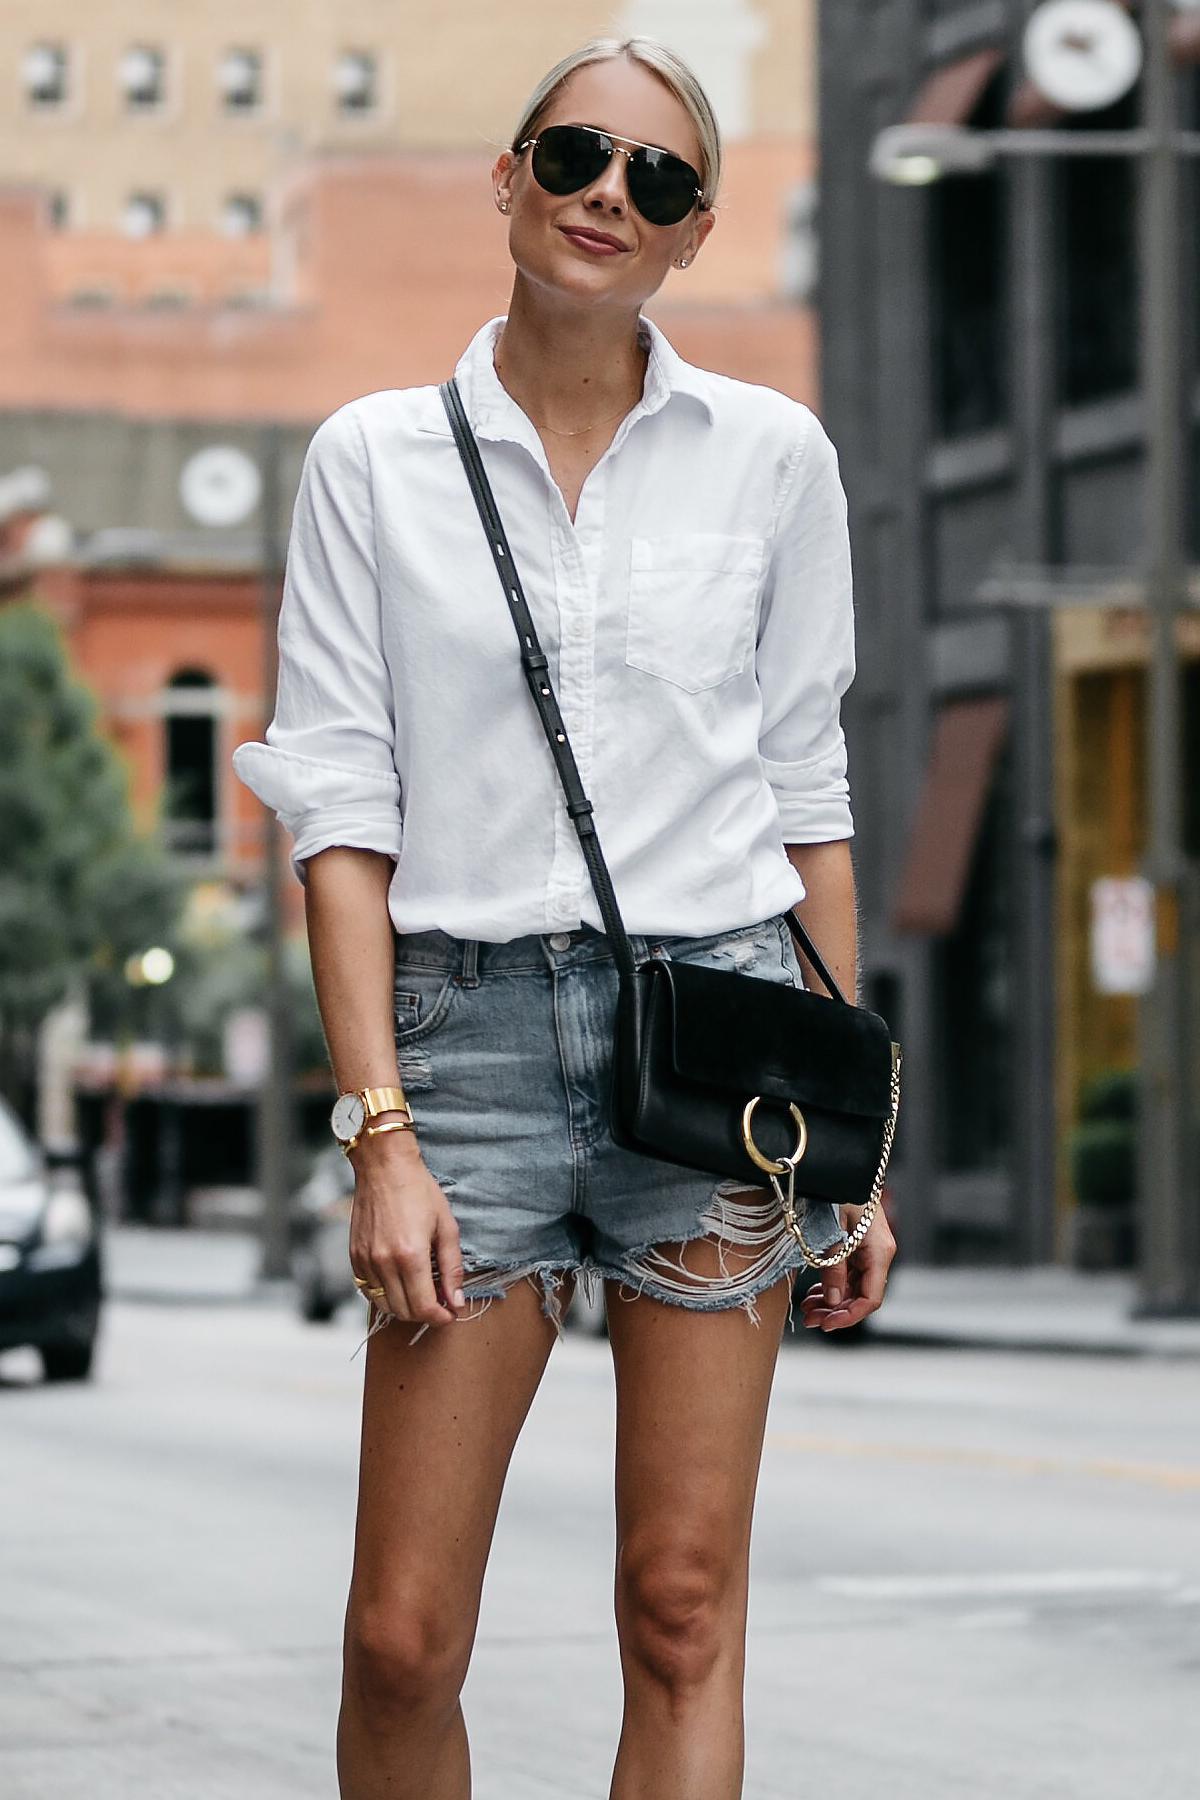 Blonde Woman Wearing Banana Republic White Button Down Shirt Topshop Ripped Denim Cutoff Shorts Outfit Chloe Faye Handbag Street Style Dallas Blogger Fashion Blogger Fashion Jackson